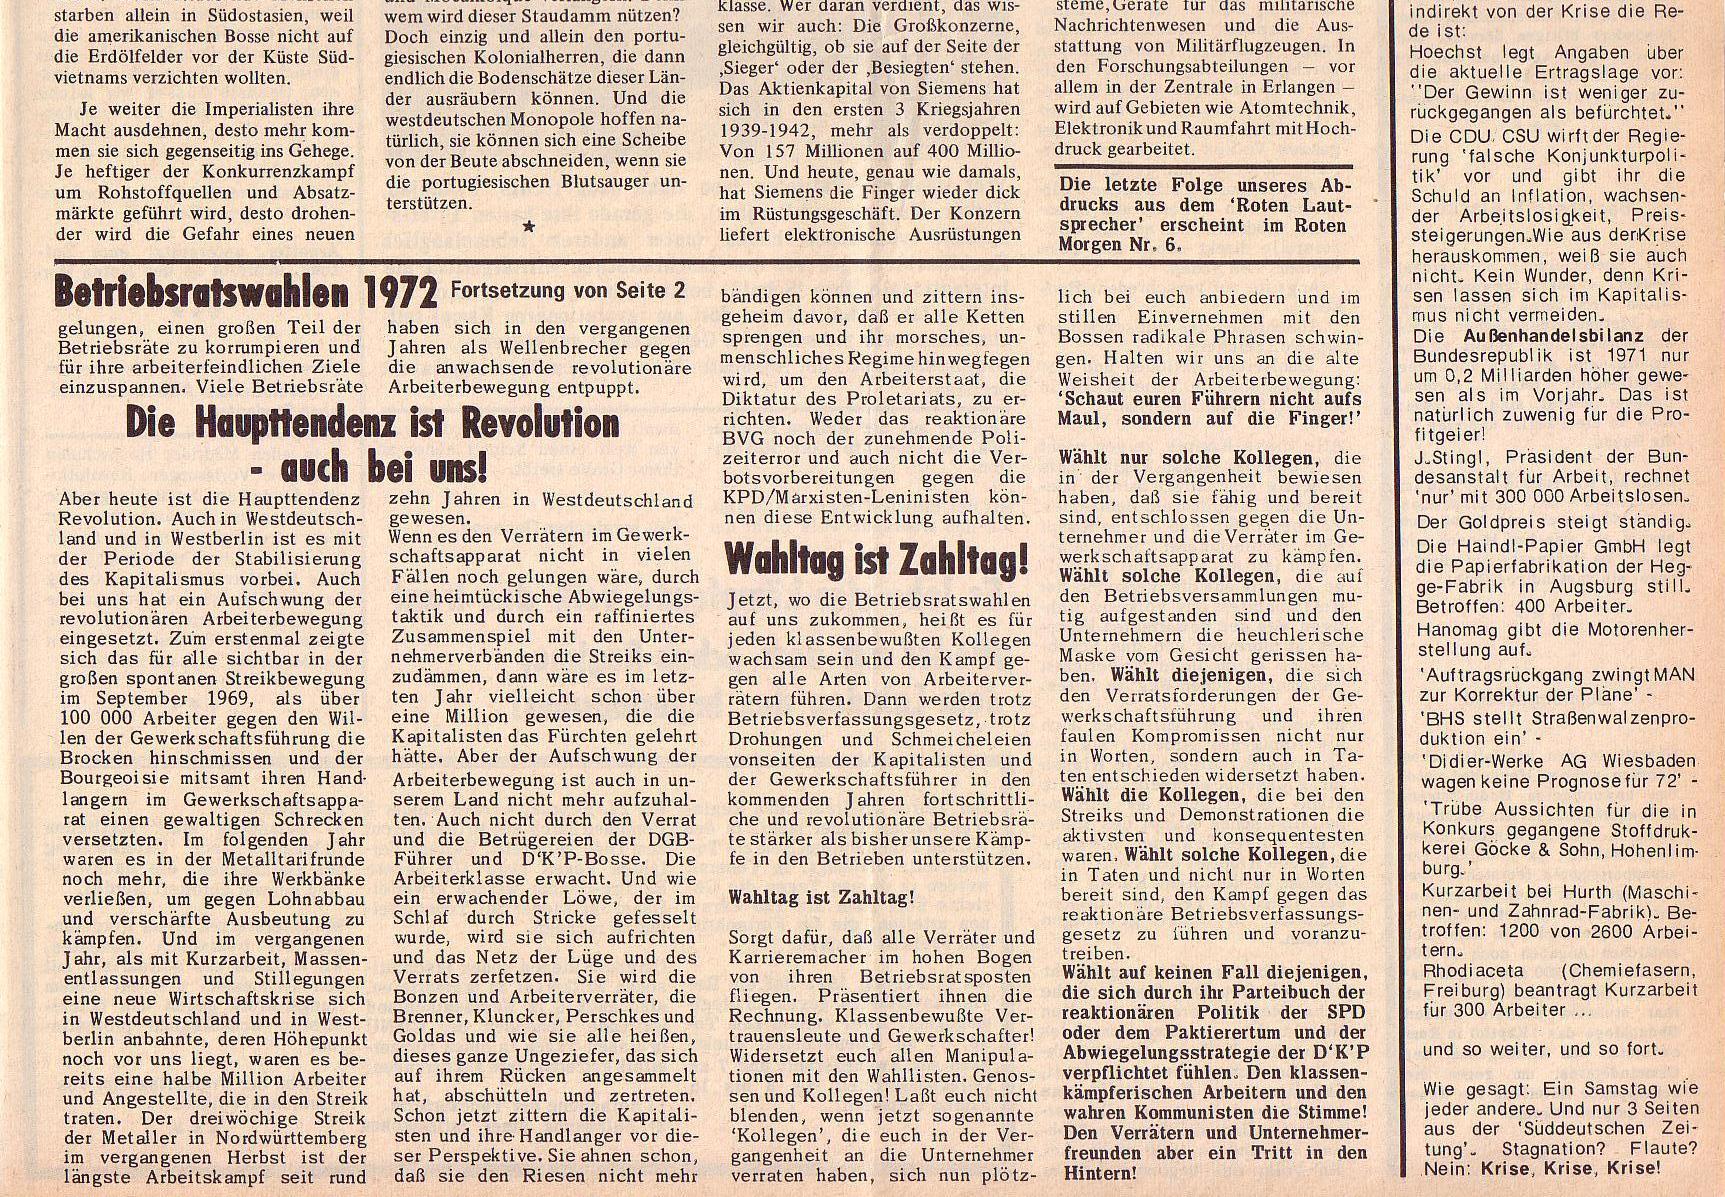 Roter Morgen, 6. Jg., 28. Februar 1972, Nr. 5, Seite 3b